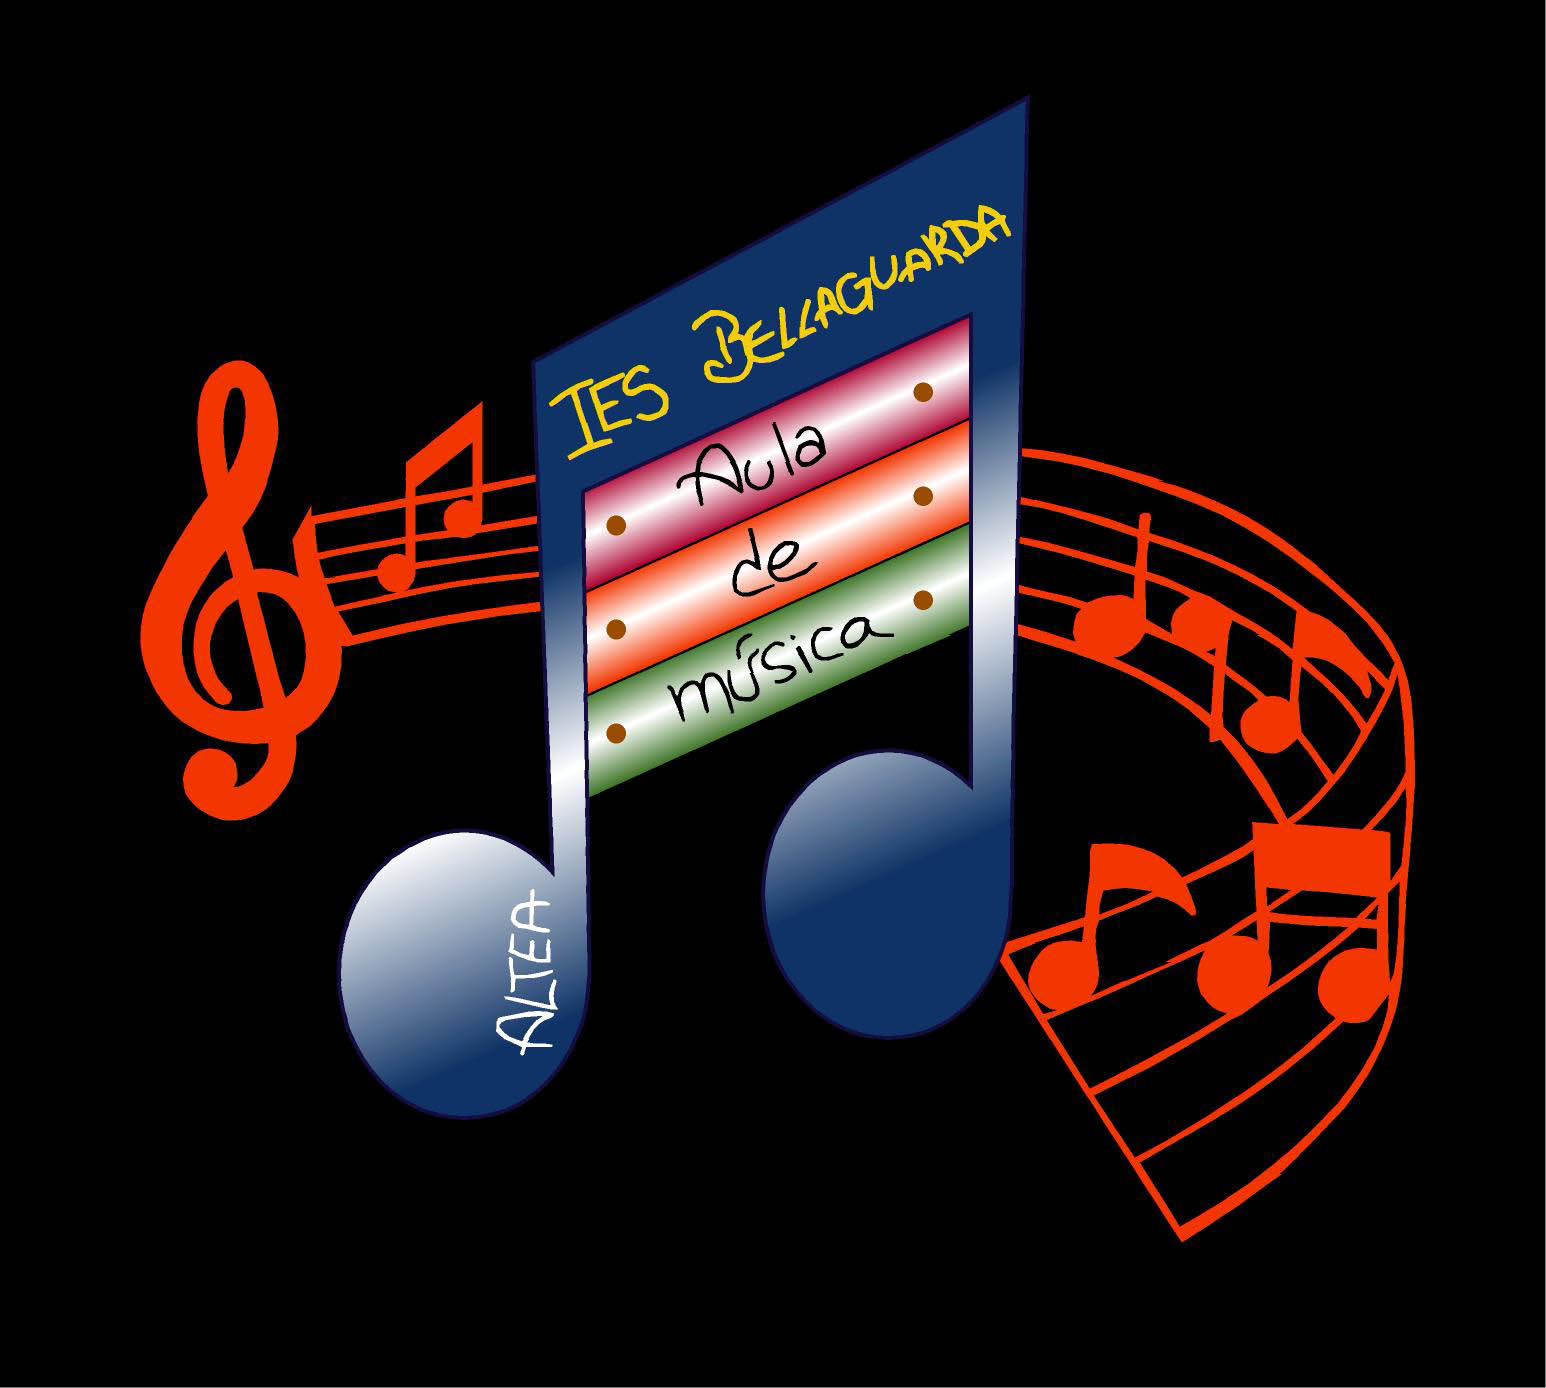 logo_musica%5B1%5D.jpg